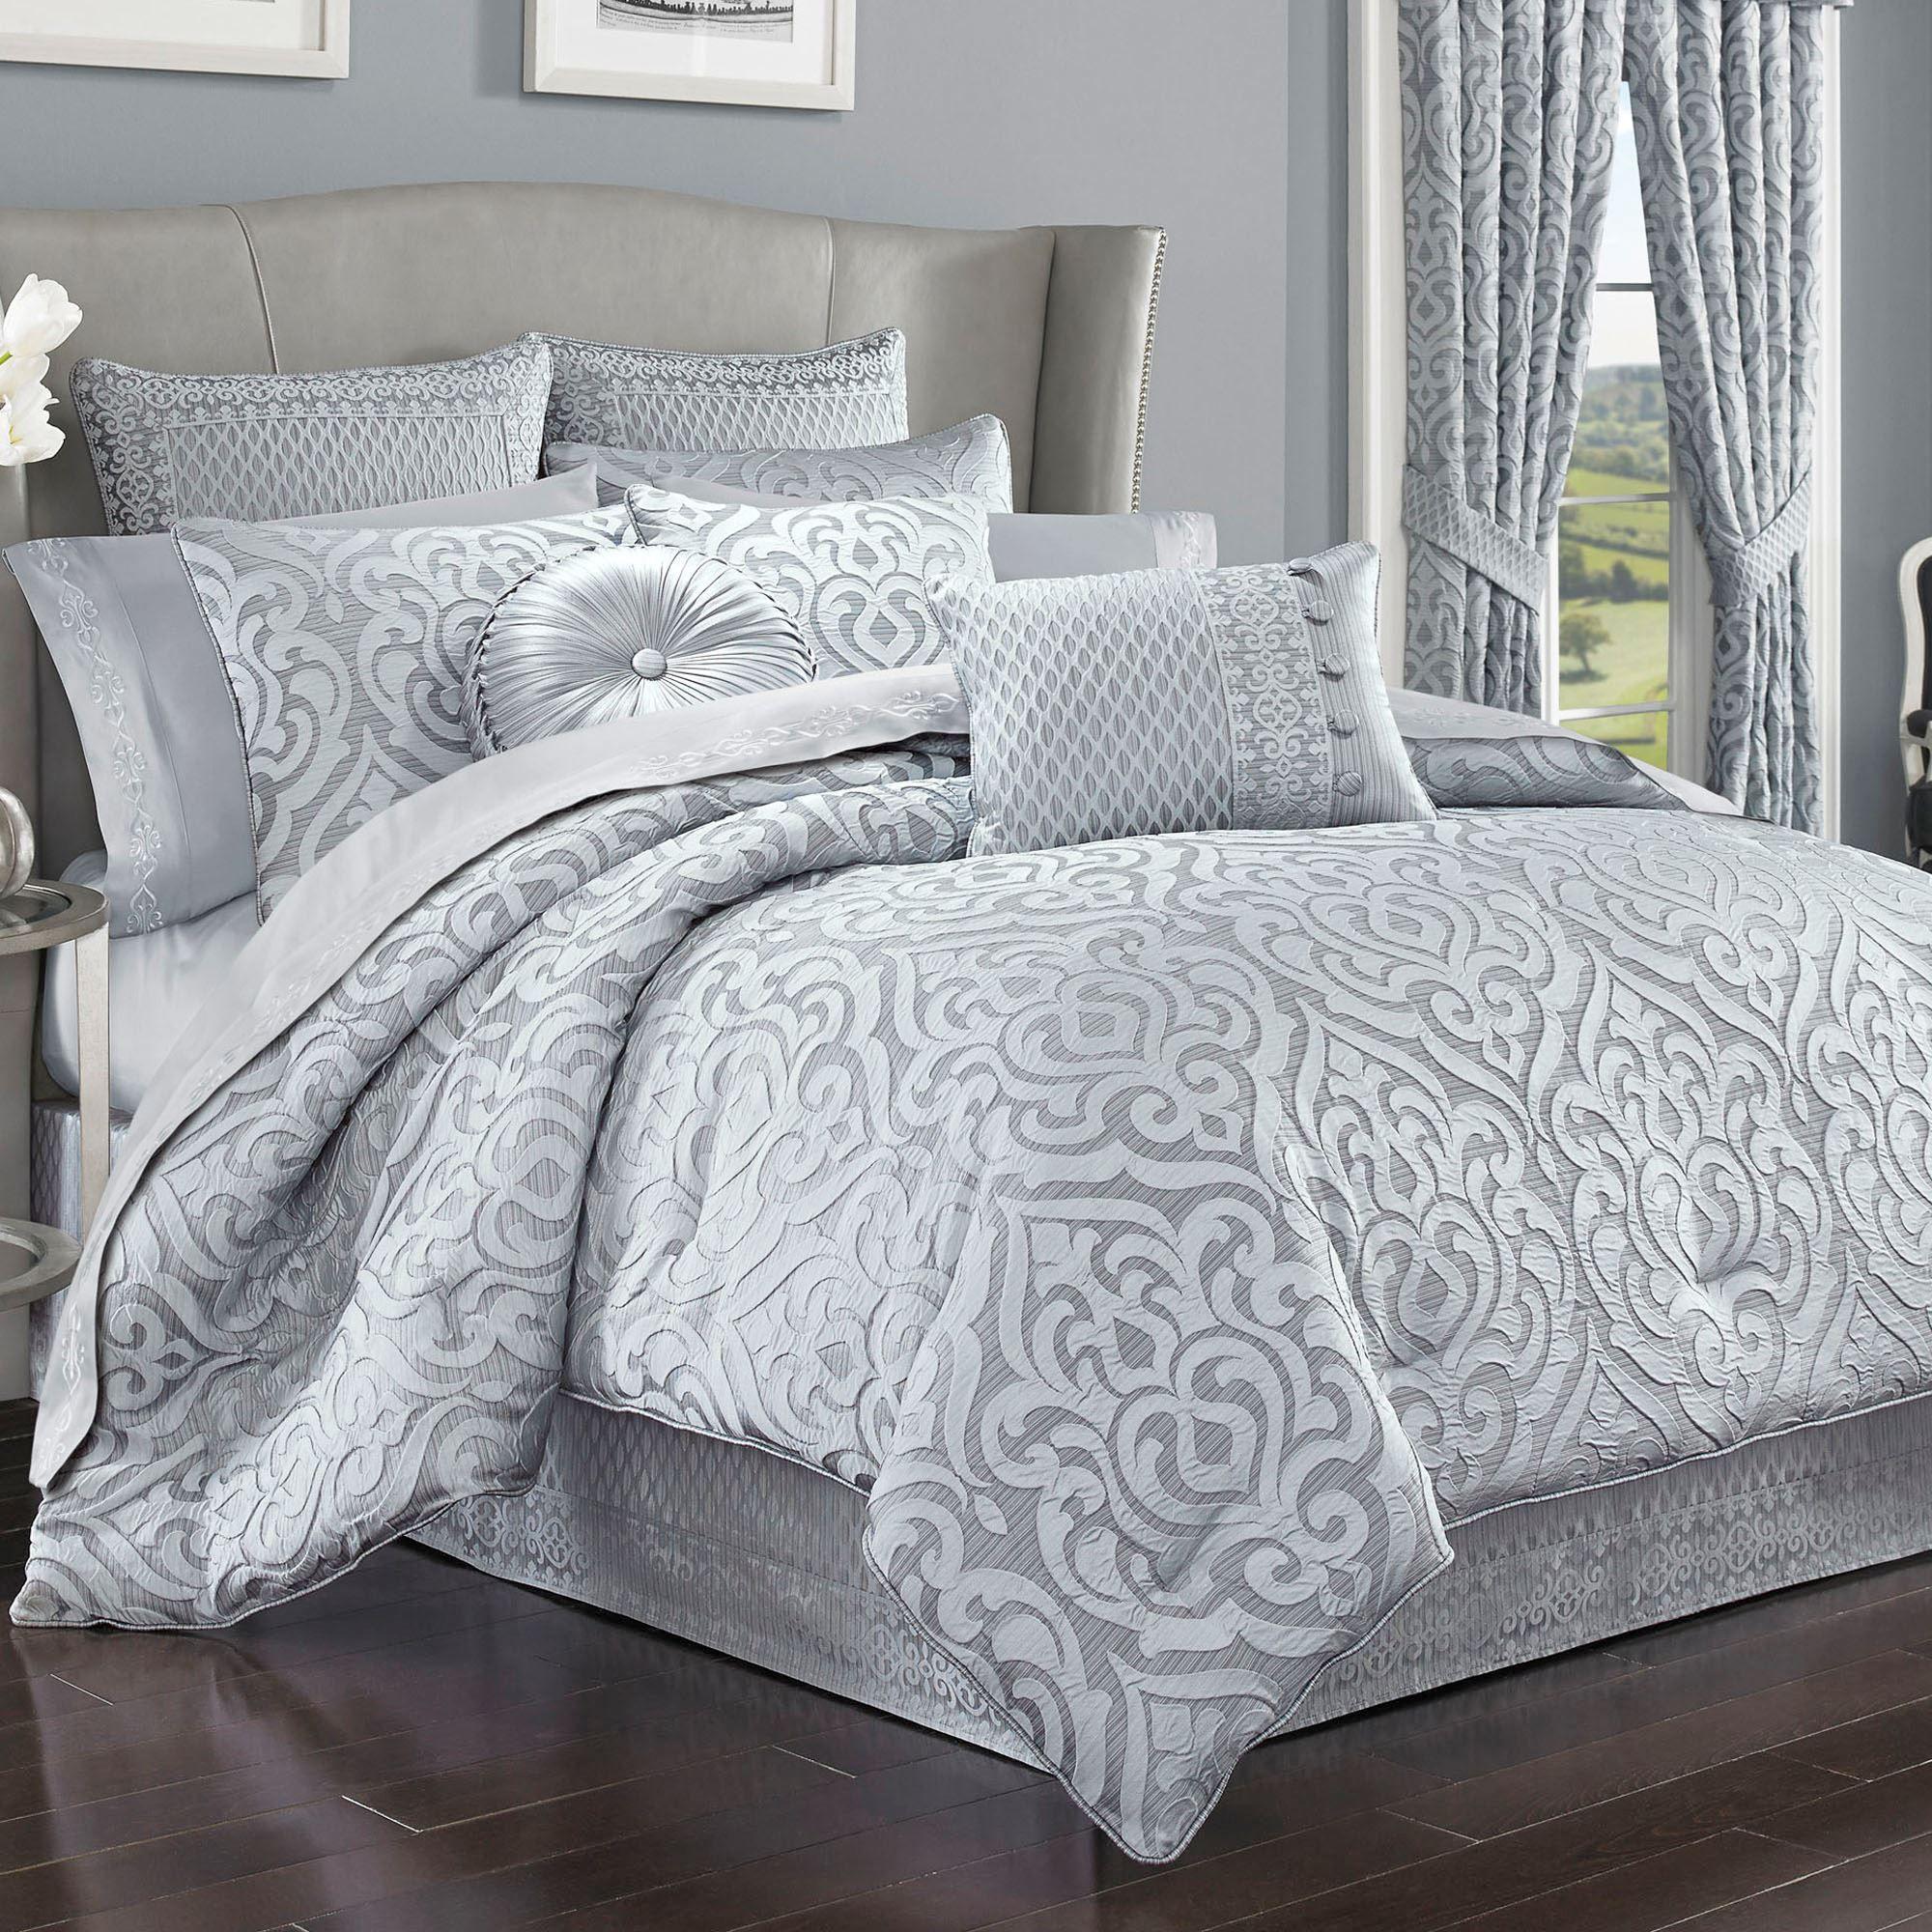 New York Bedding Collection Bedding Designs